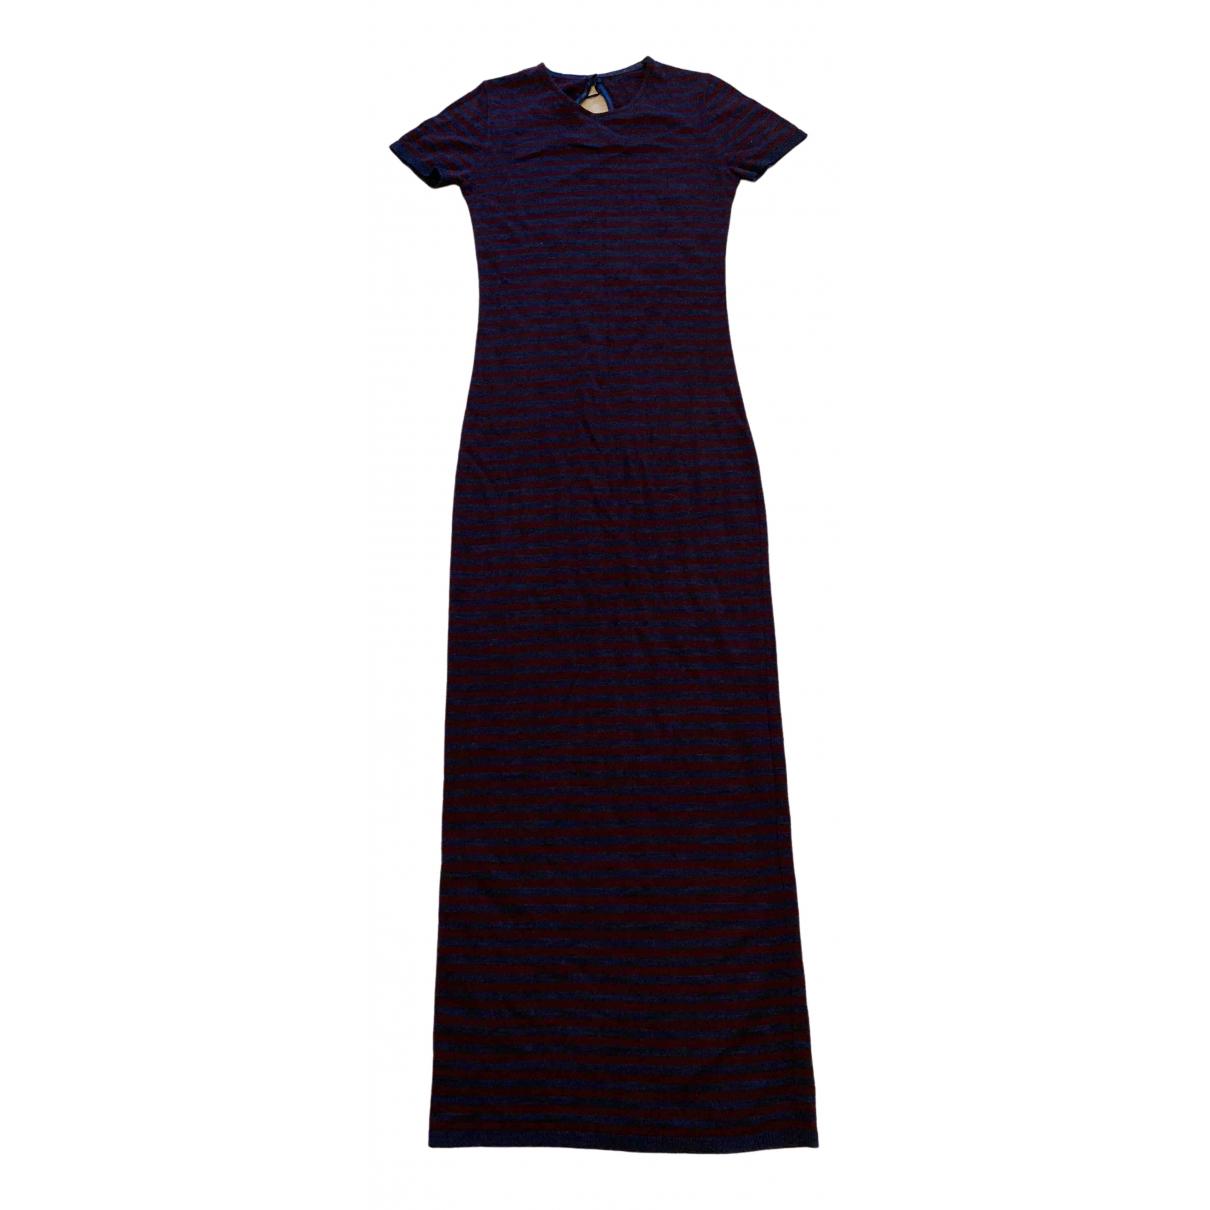 Zara \N Navy dress for Women XS International